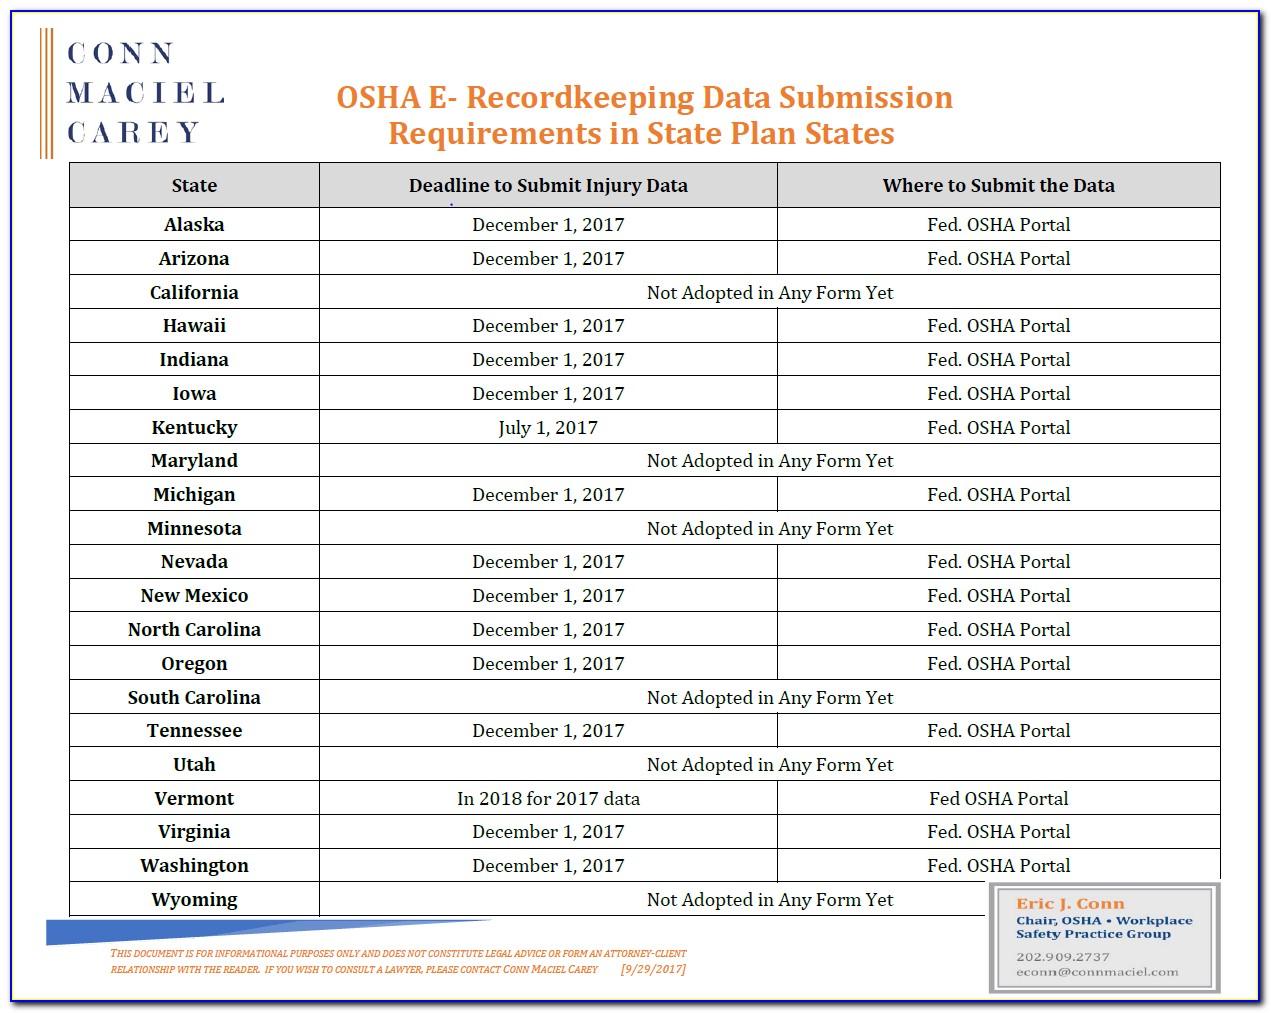 Osha Forms For Recording 2017